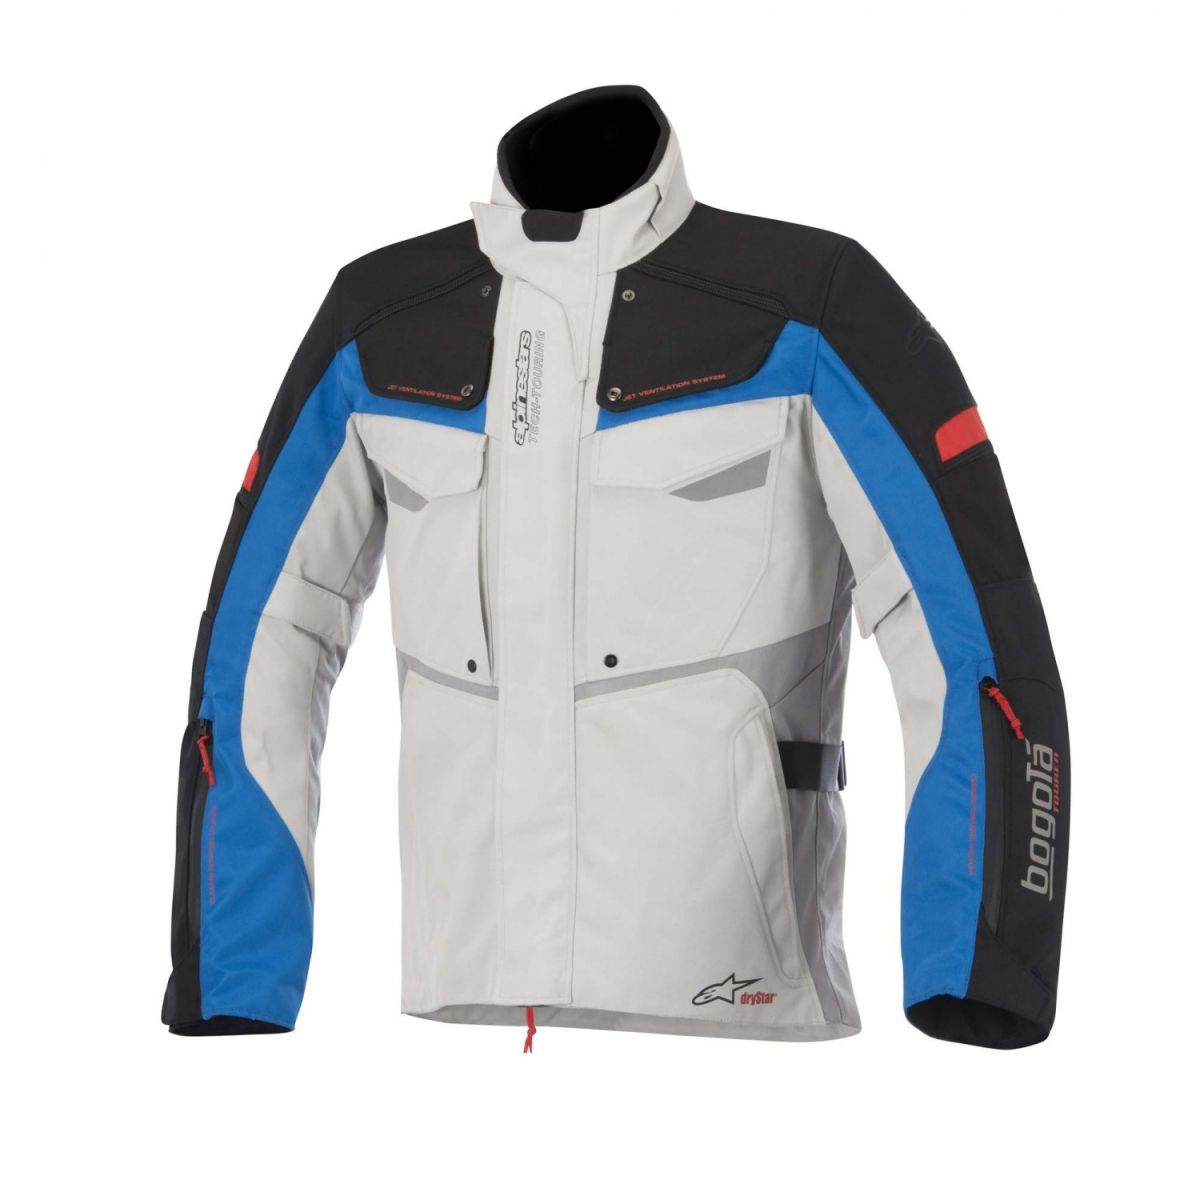 Jaqueta Alpinestars Bogotá Drystar® Preta, Cinza e Azul /impermeável para Big Trail  - Super Bike - Loja Oficial Alpinestars